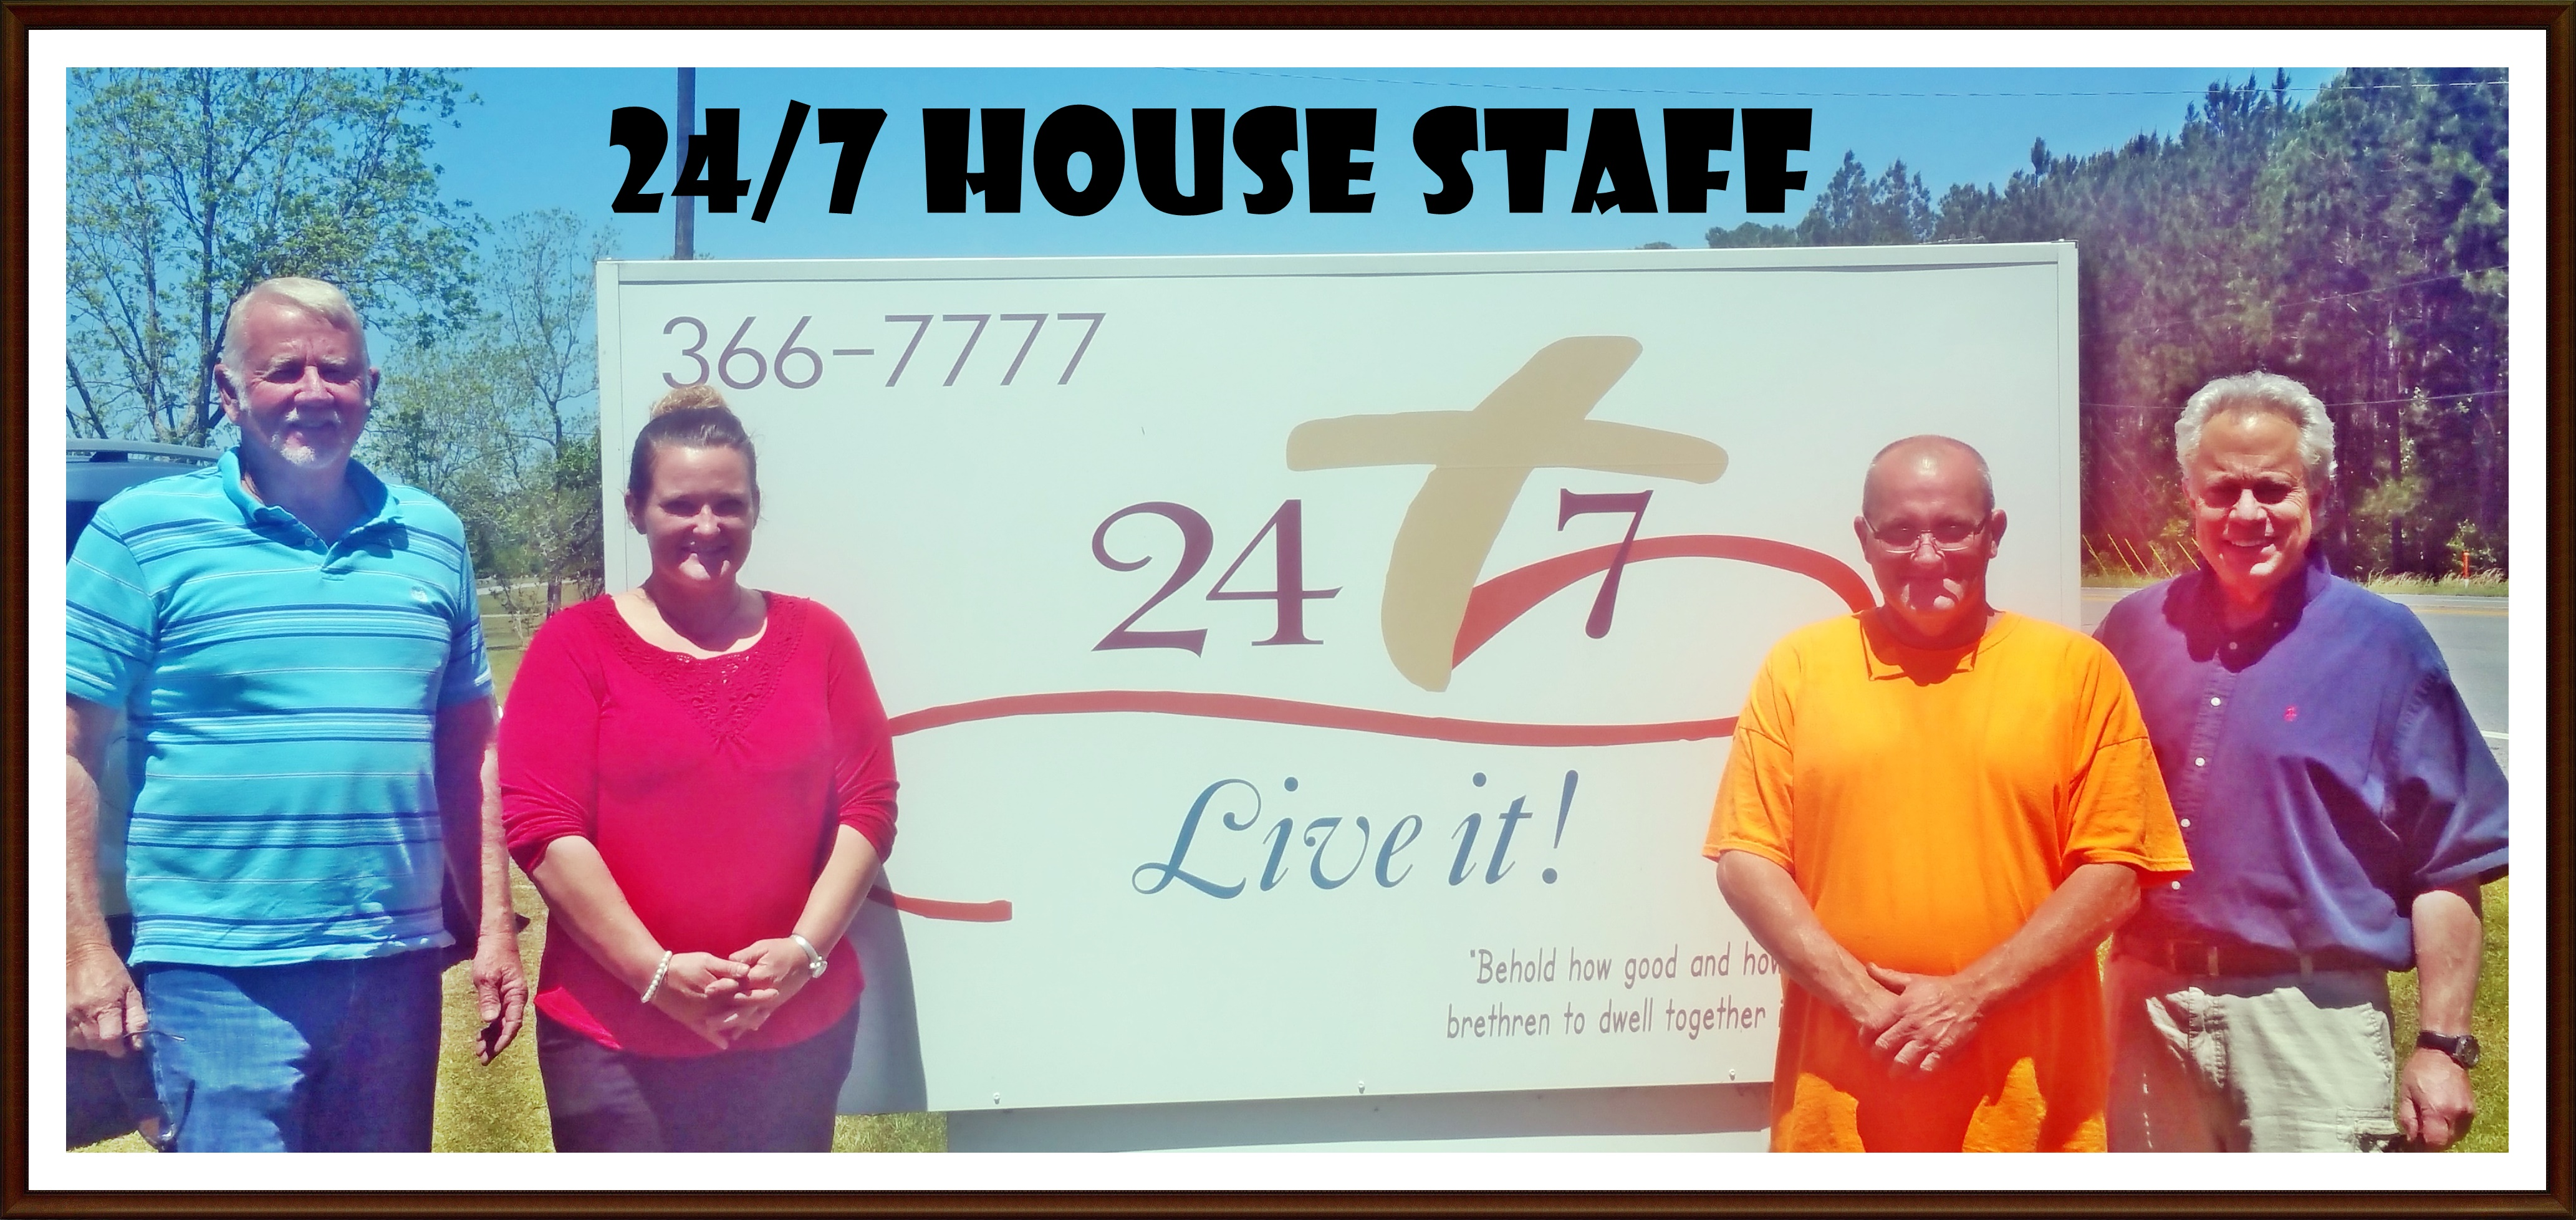 247 house staff